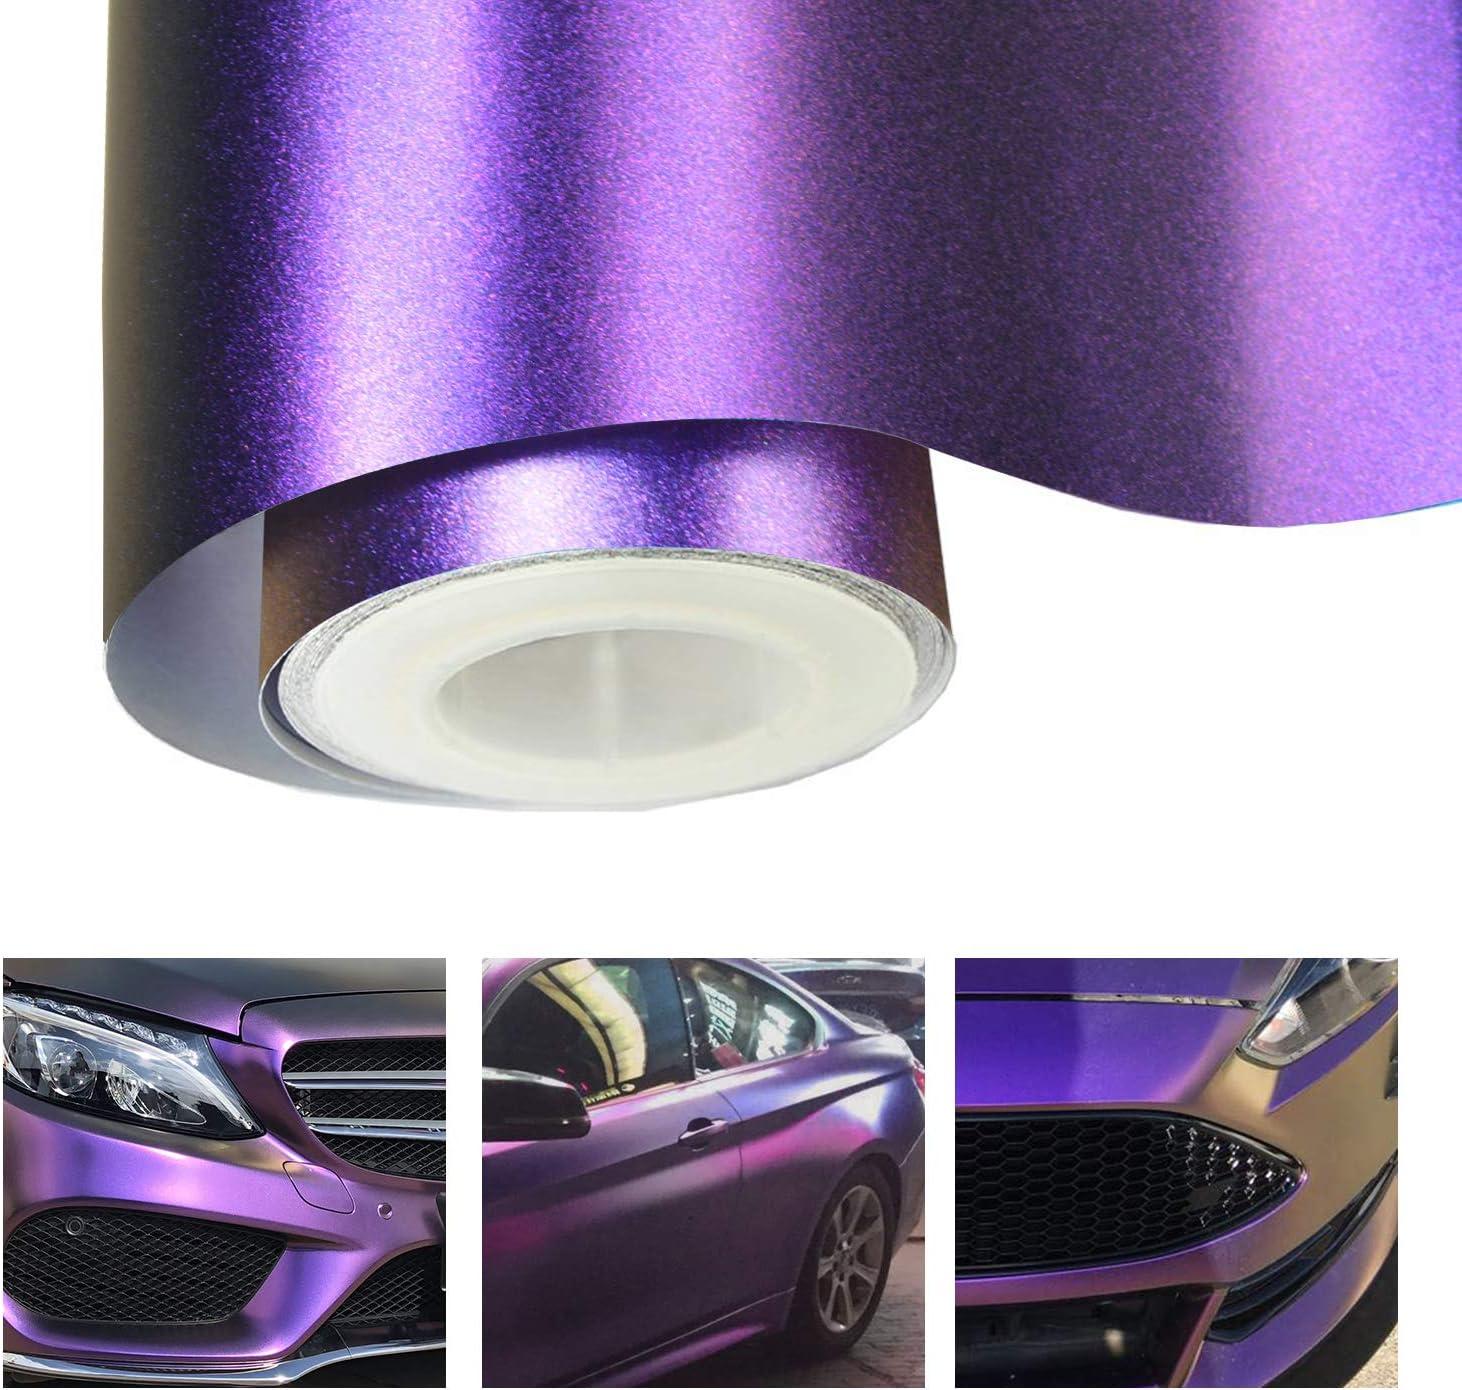 Matte Metallic Purple Vinyl Car Wrap Decal Roll You Choose Size Vvivid